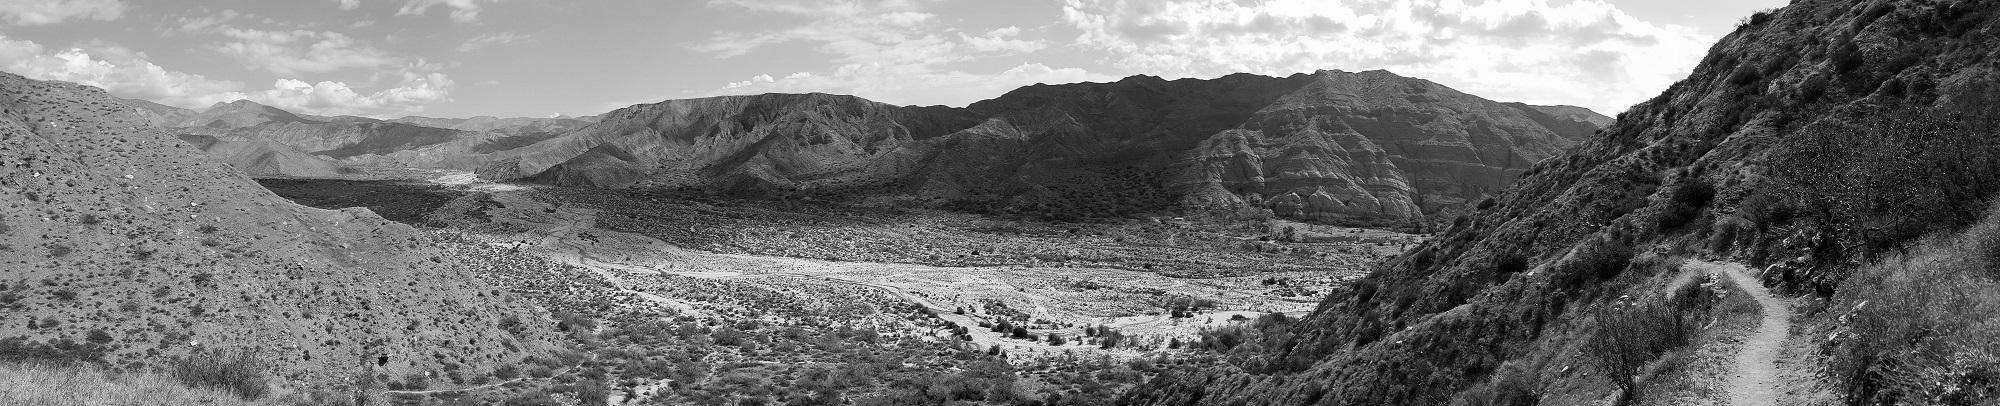 May 4 - descending WW - panorama